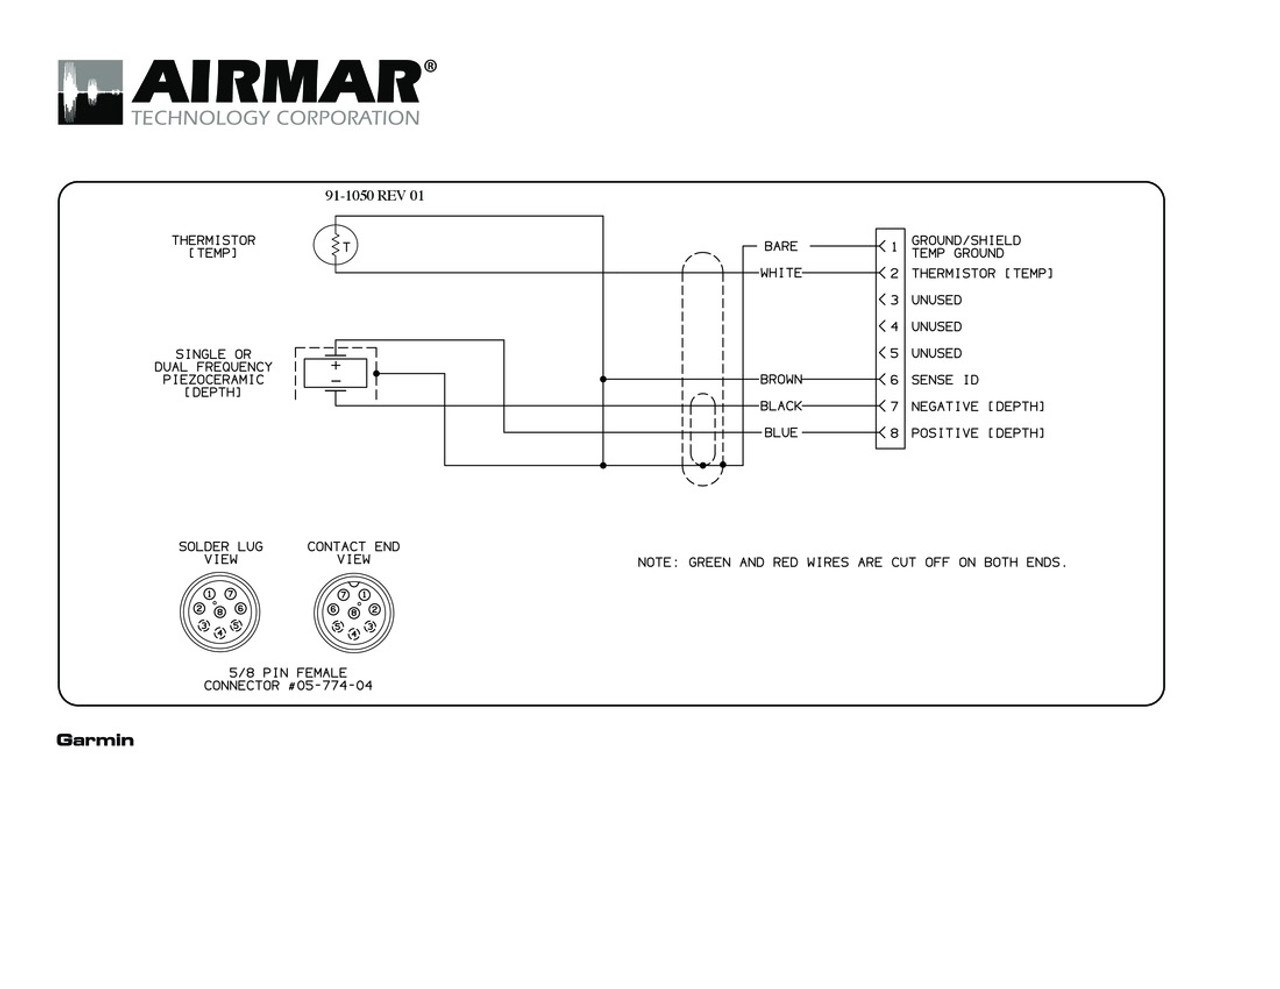 medium resolution of airmar wiring diagram garmin p319 8 pin d t blue bottle marine garmin marine gps wiring diagram garmin marine wiring diagram